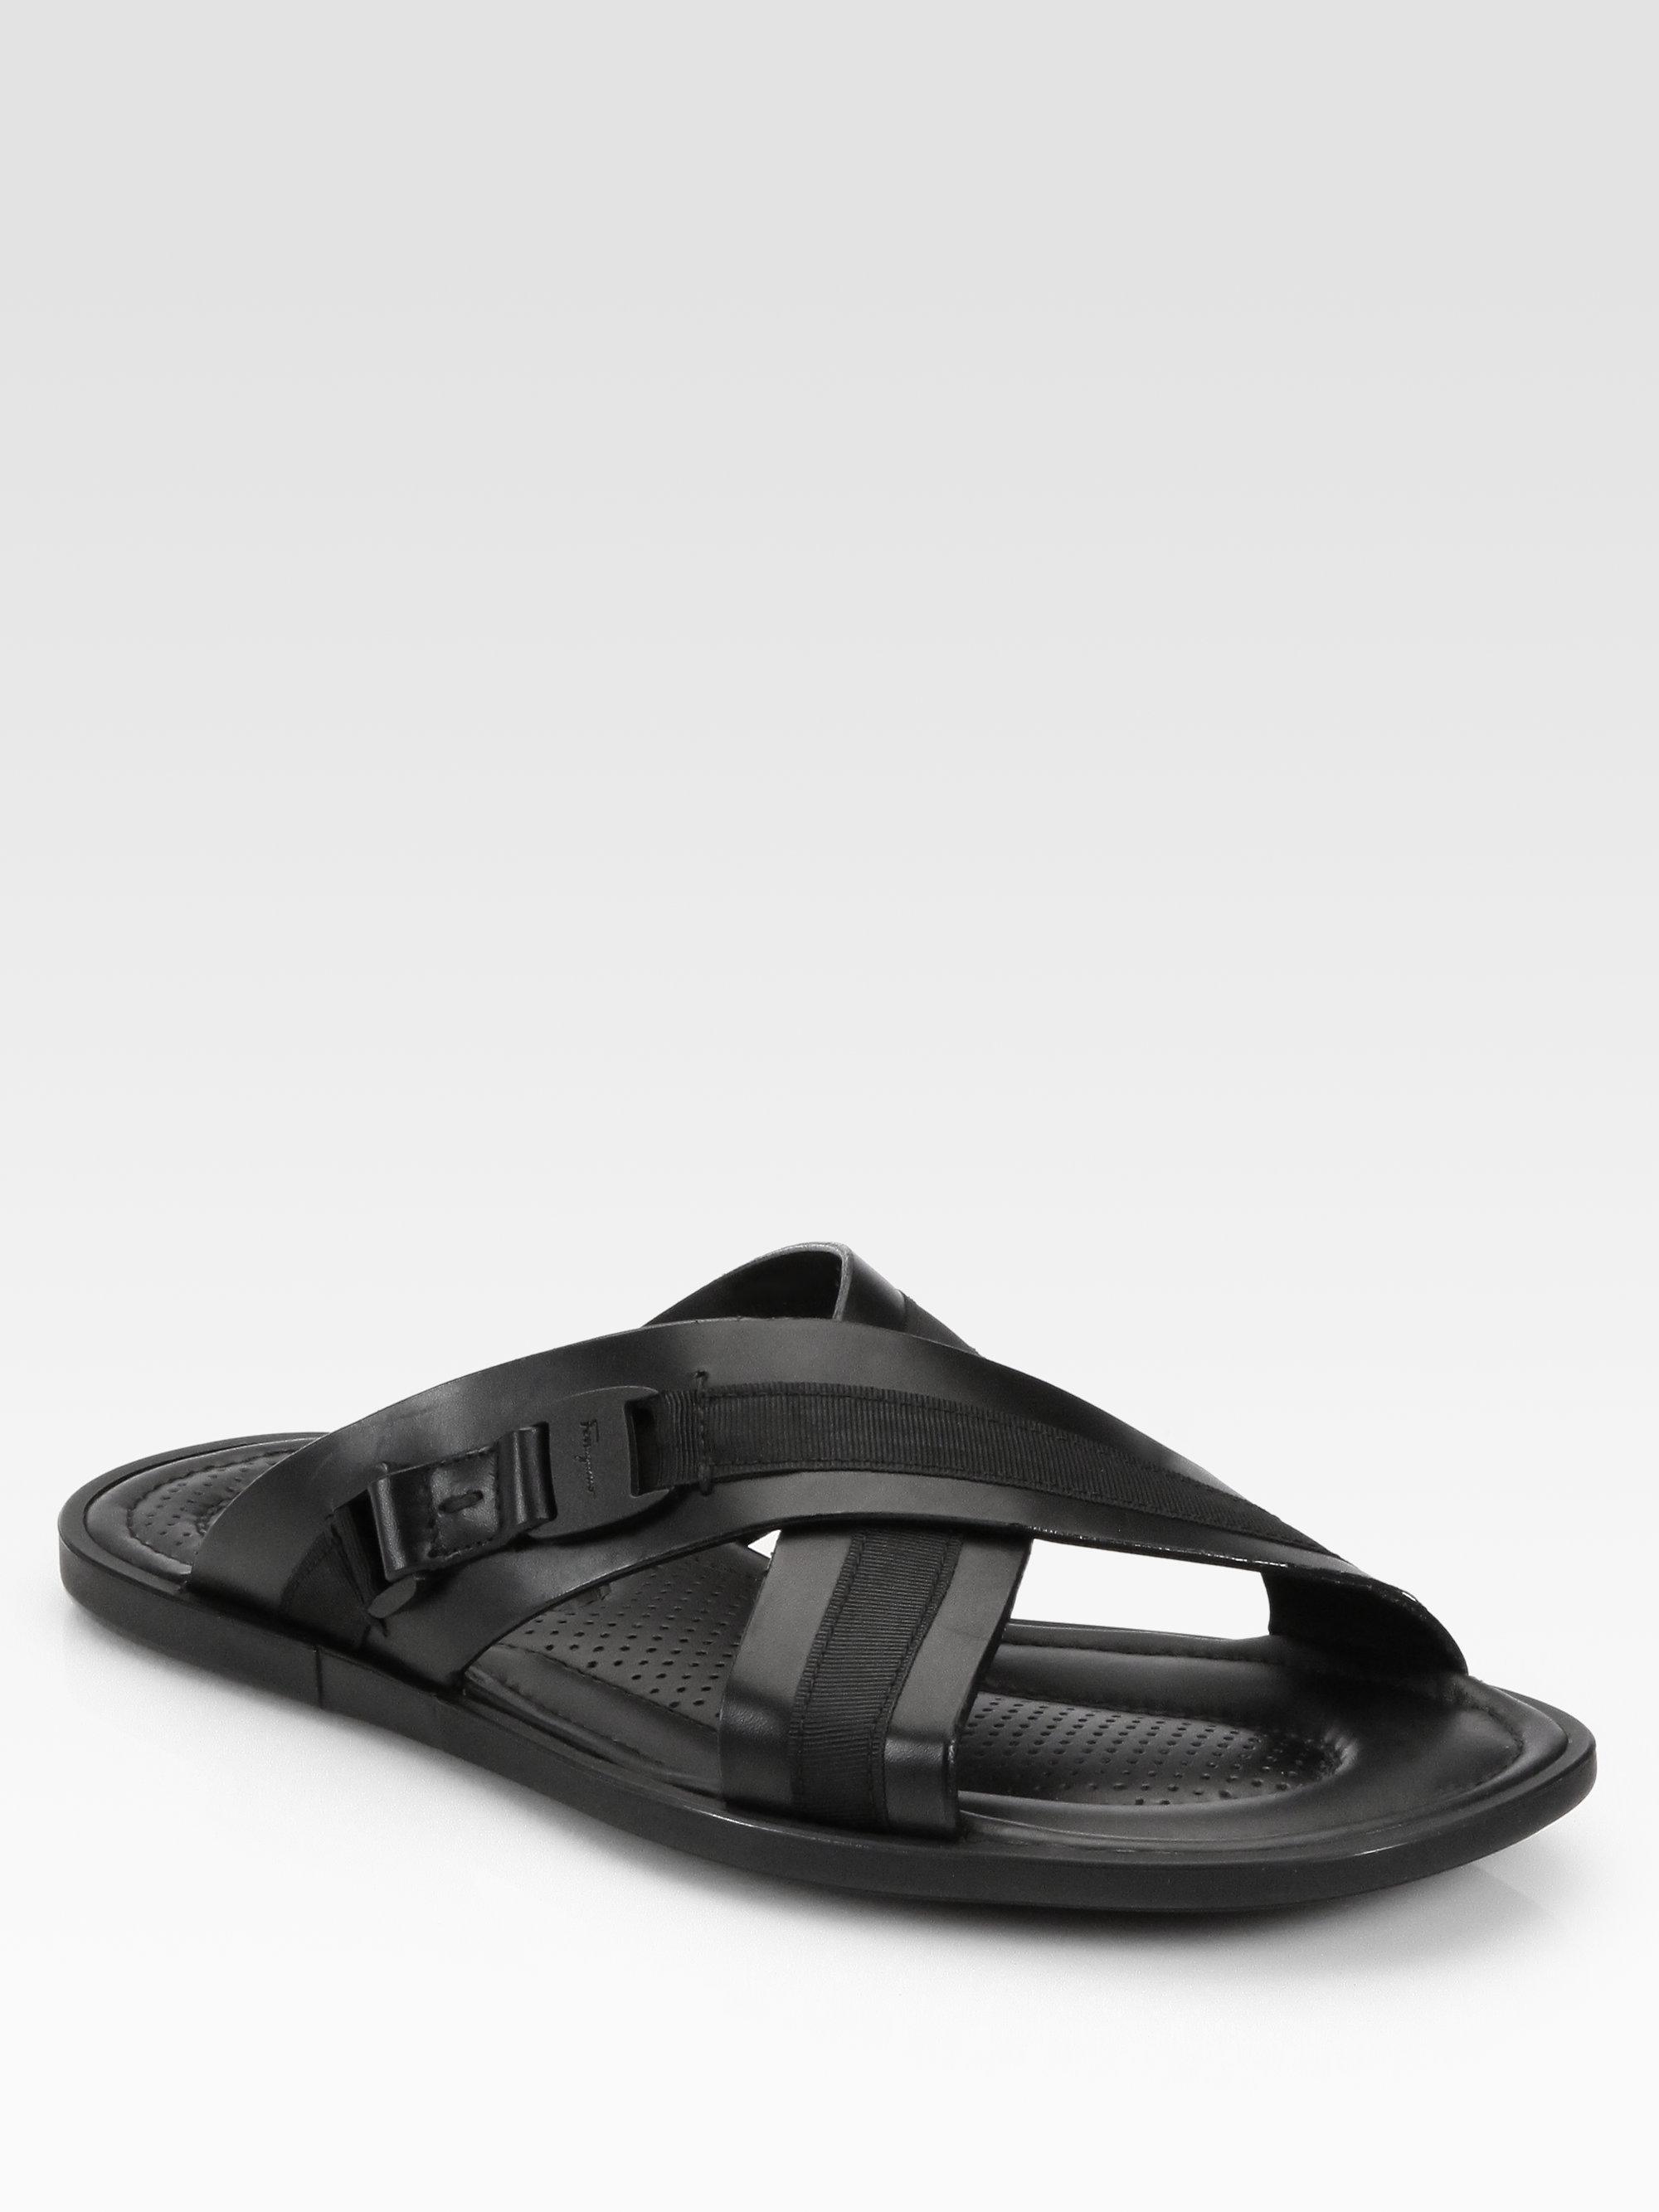 Ferragamo Tolis Slide Sandals In Black For Men Lyst